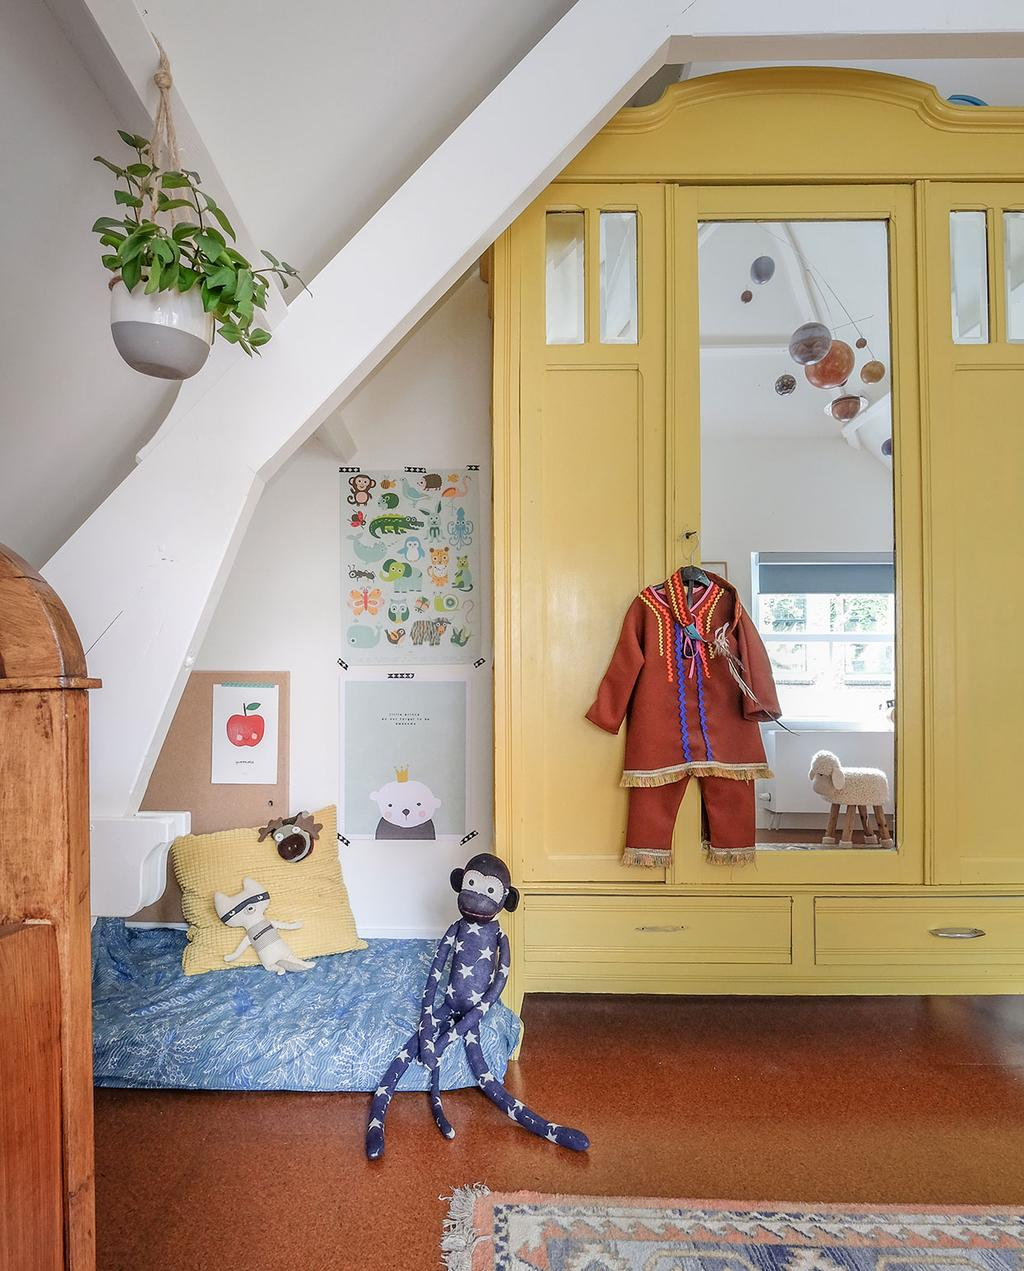 vtwonen 03-2021 | kinderkamer met gele kast en knuffels